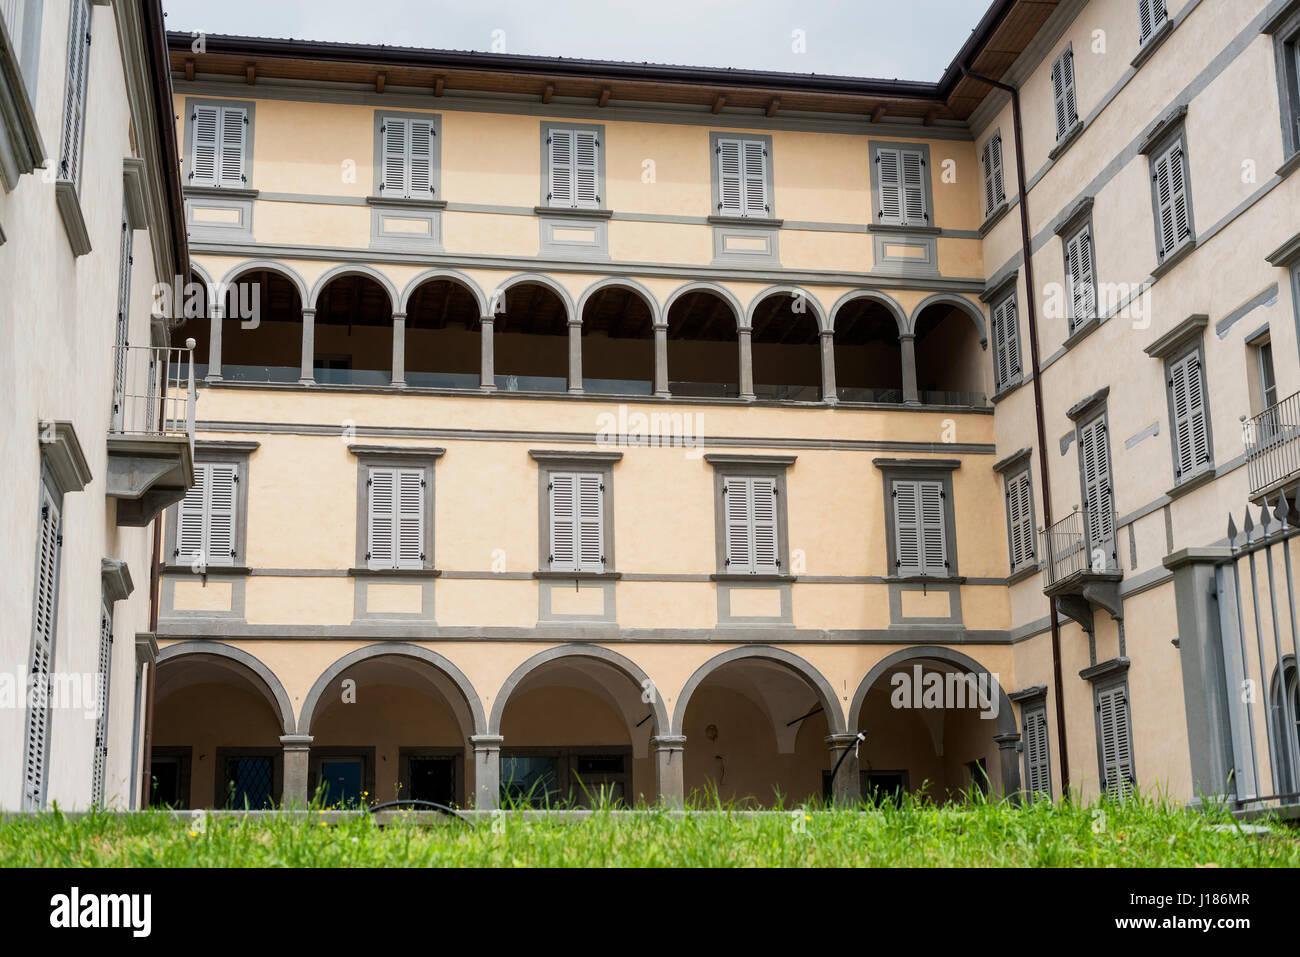 Lovere (Bergamo, Lombardy, Italy): exterior of historic palace - Stock Image